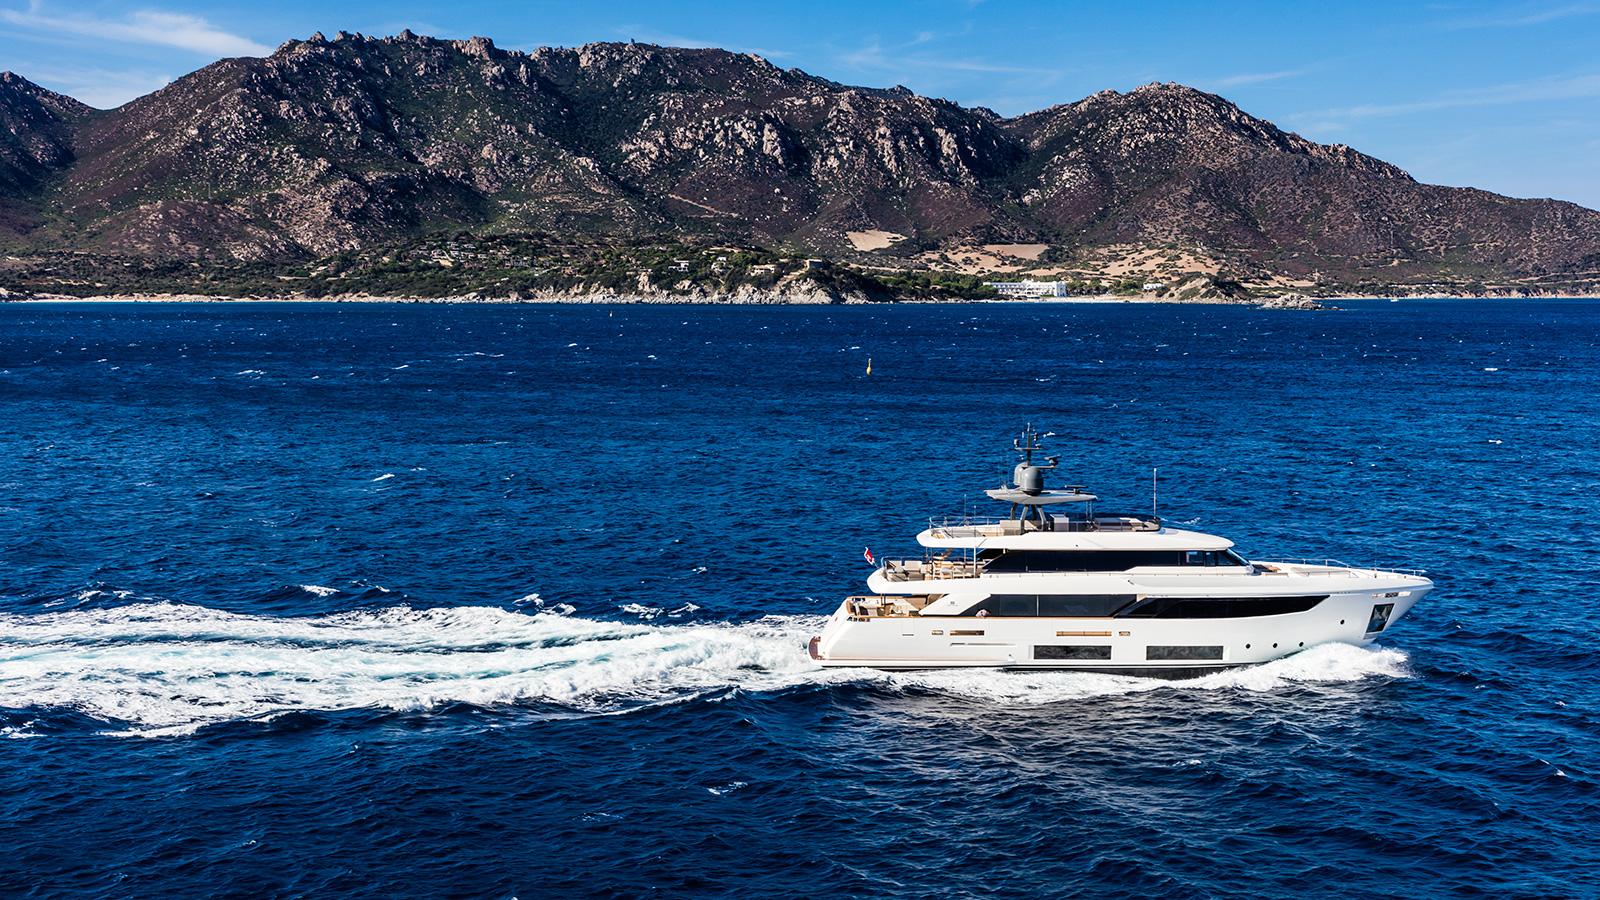 side-view-of-the-ferretti-custom-line-motor-yacht-telli-credit-maurizio-paradisi